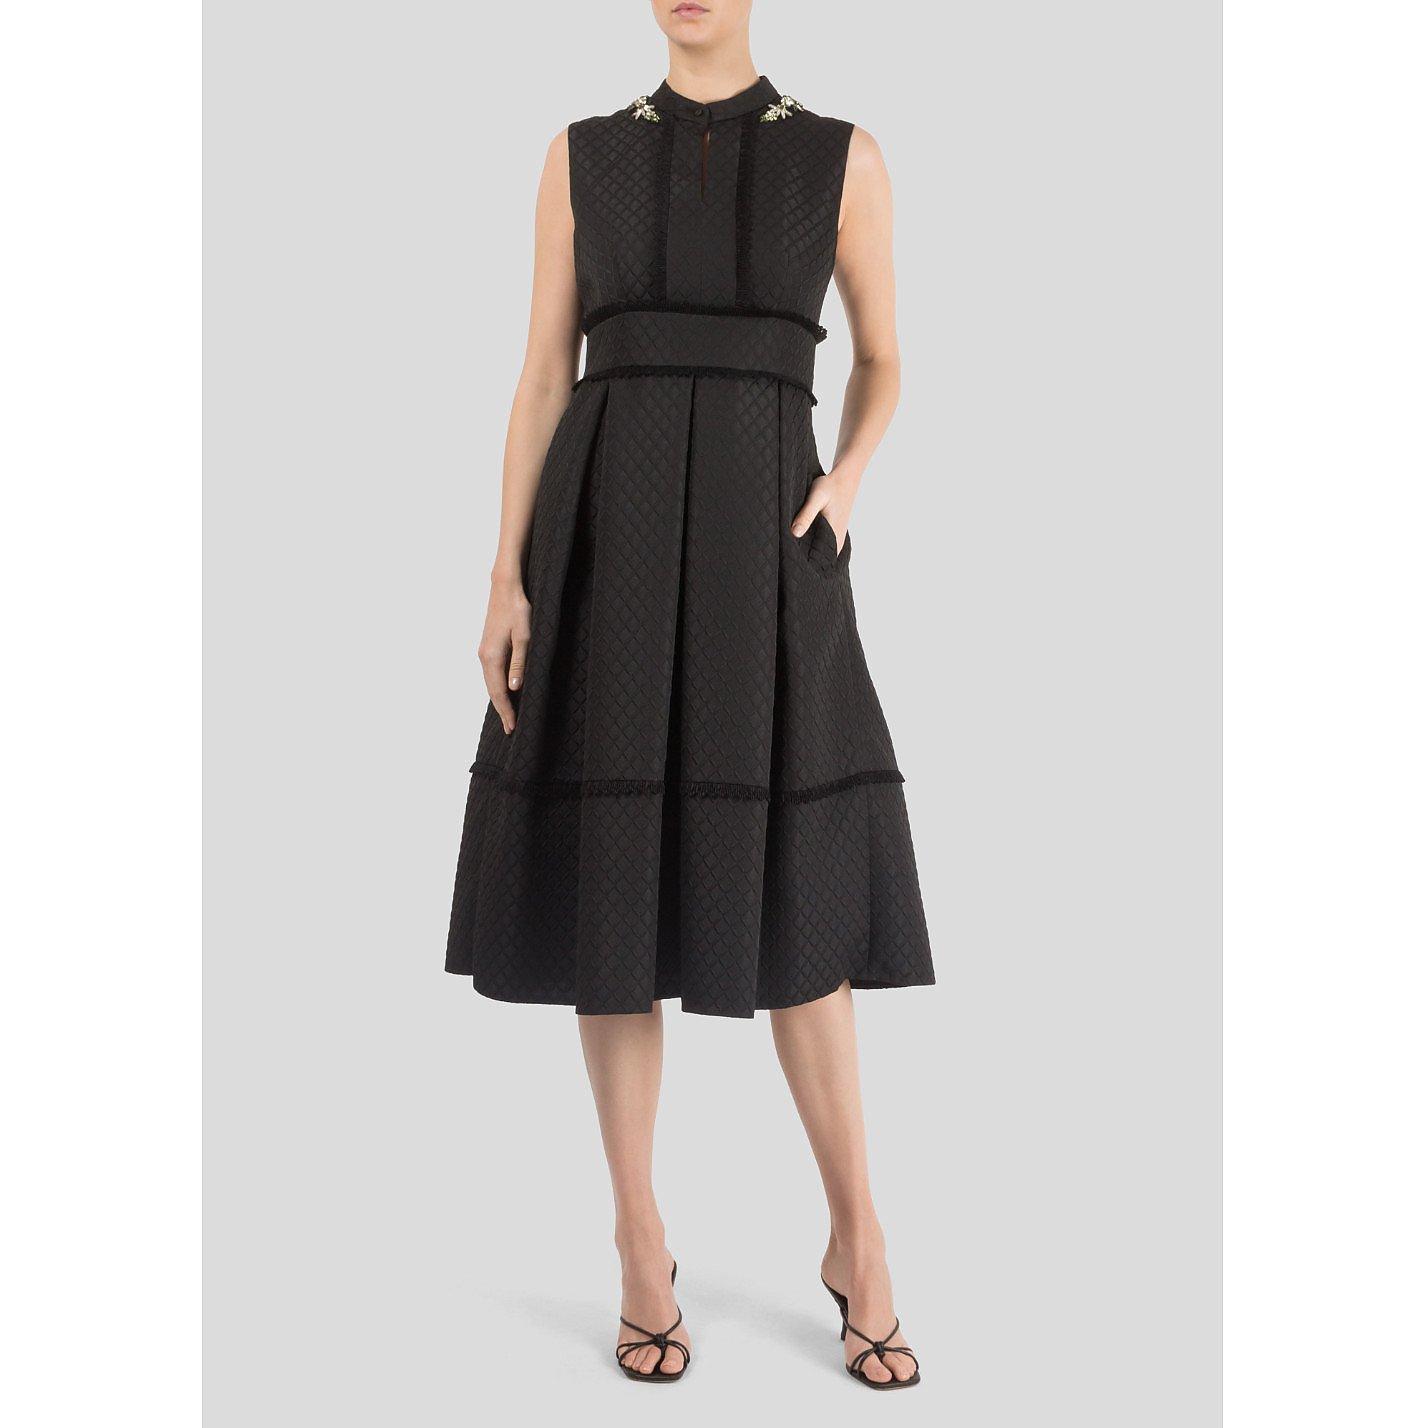 Erdem Jewelled Neckline Dress